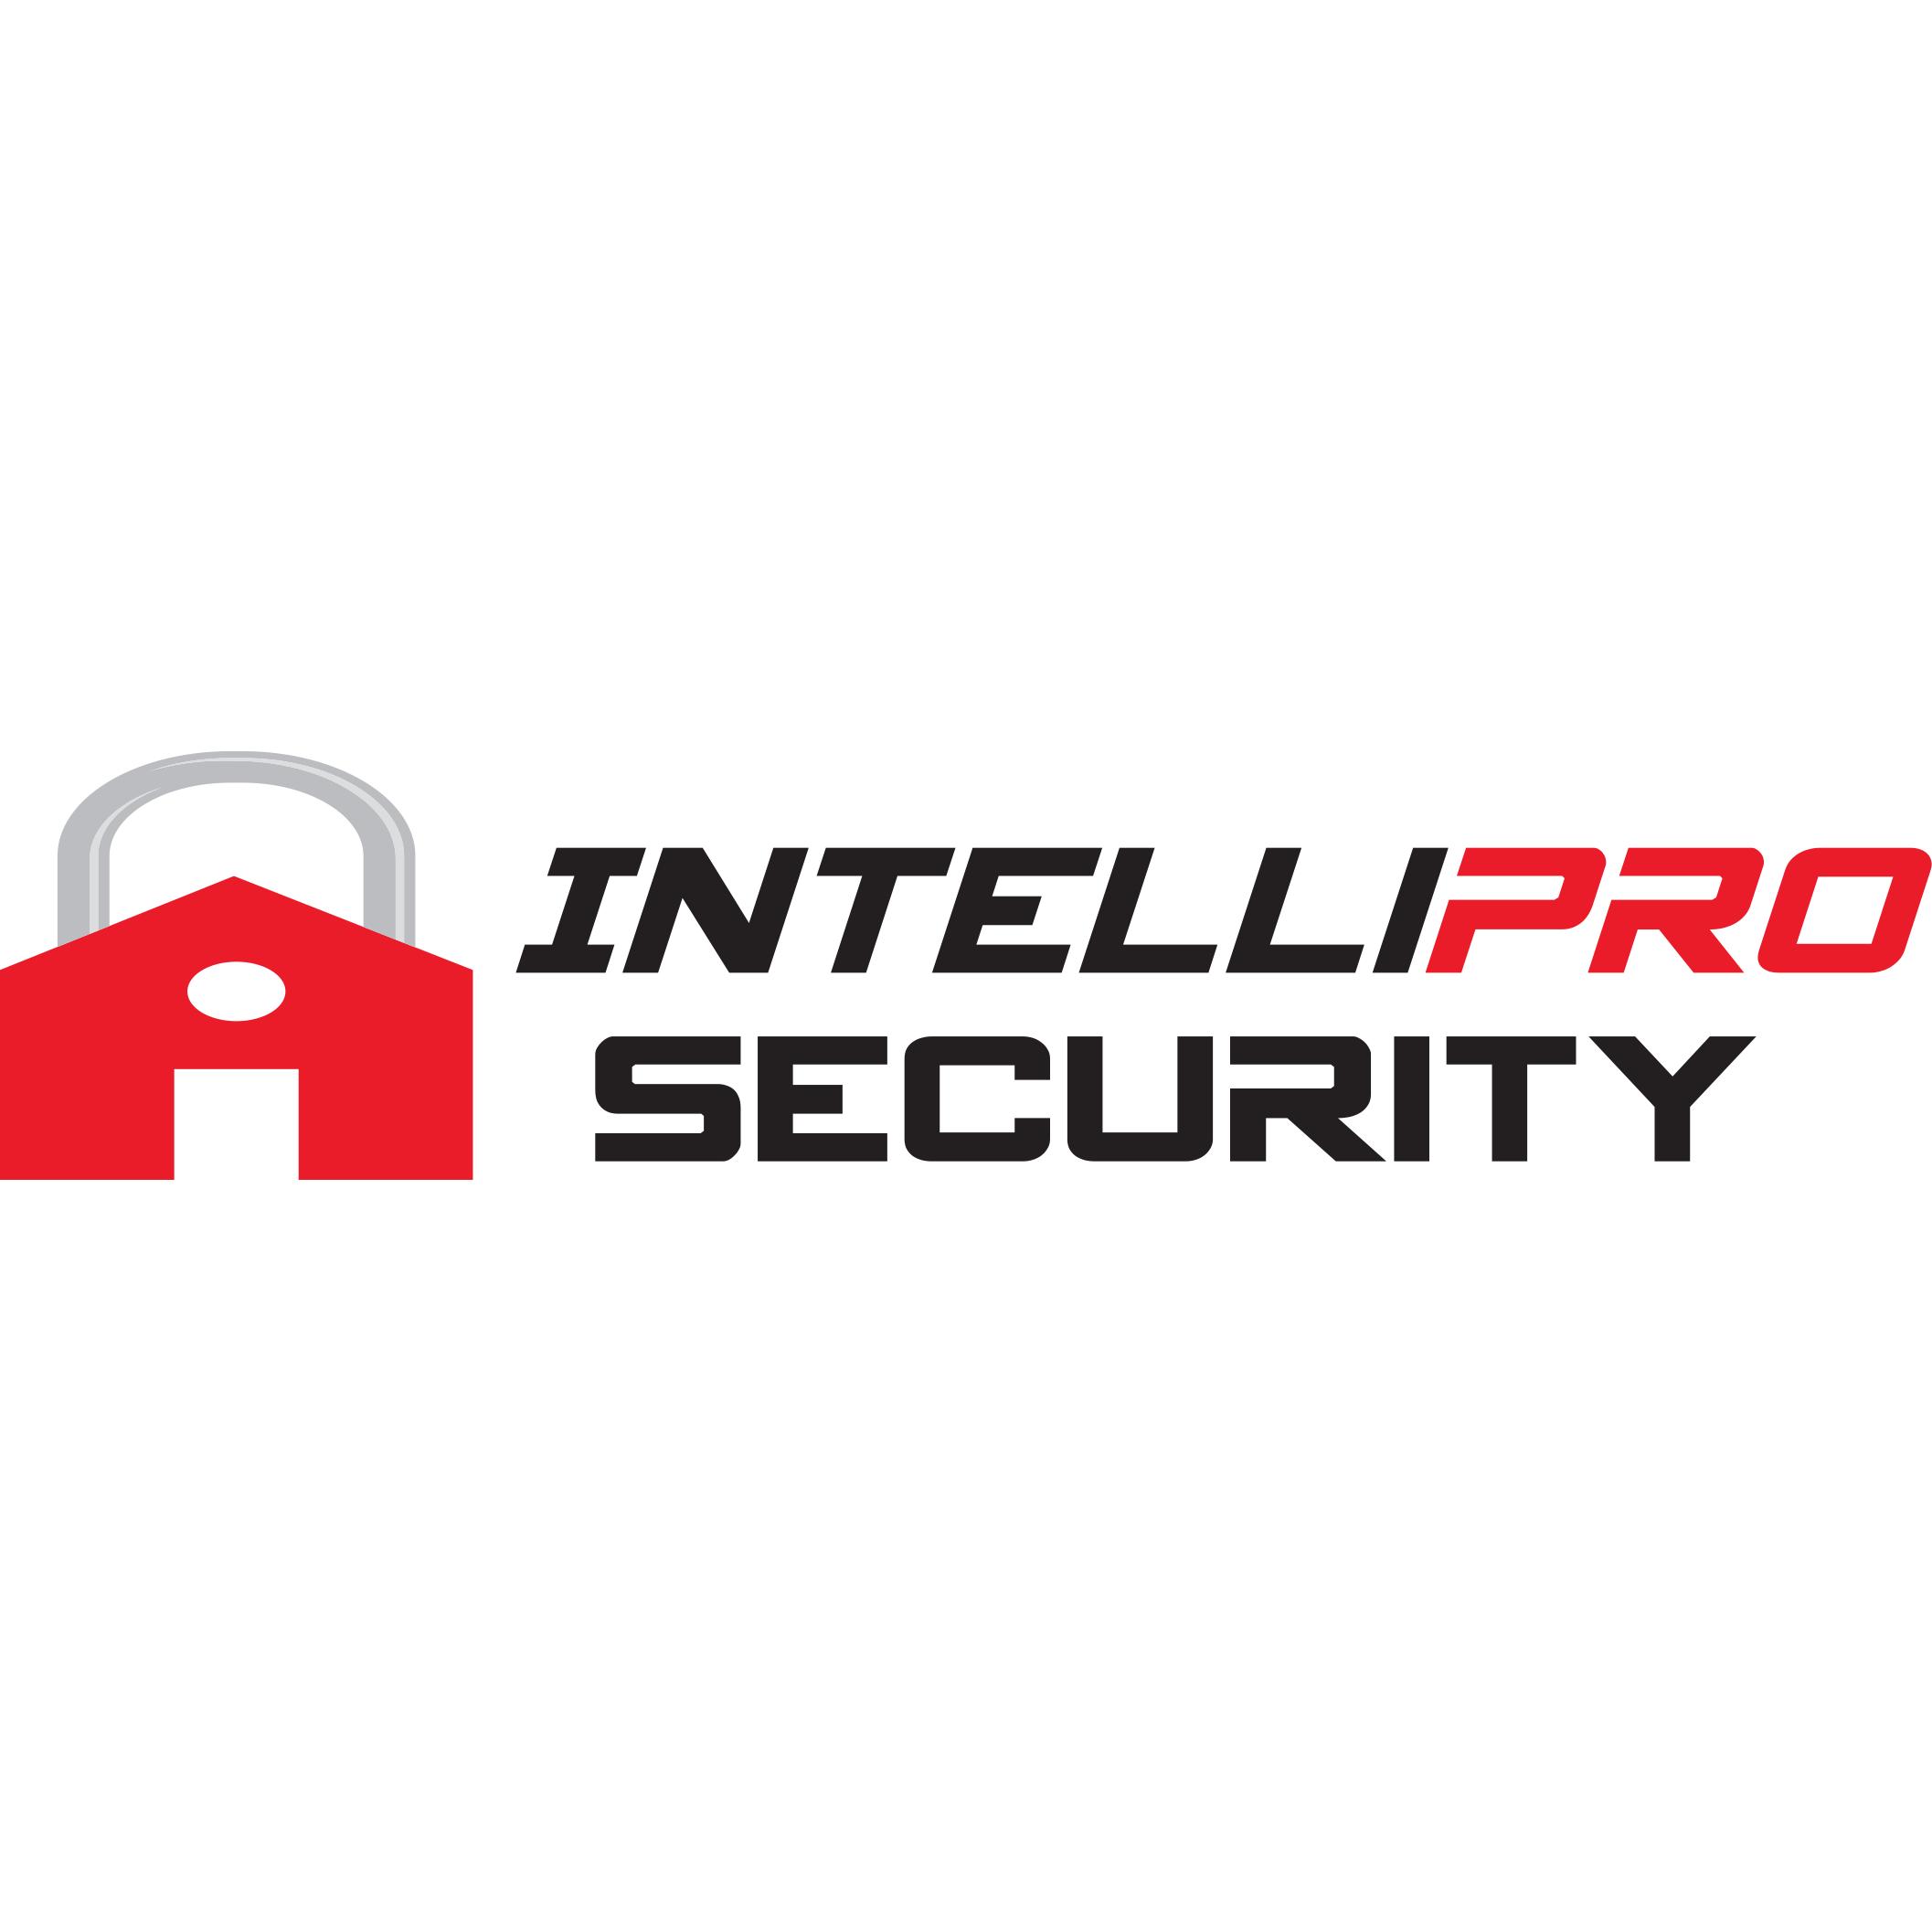 Intellipro Security